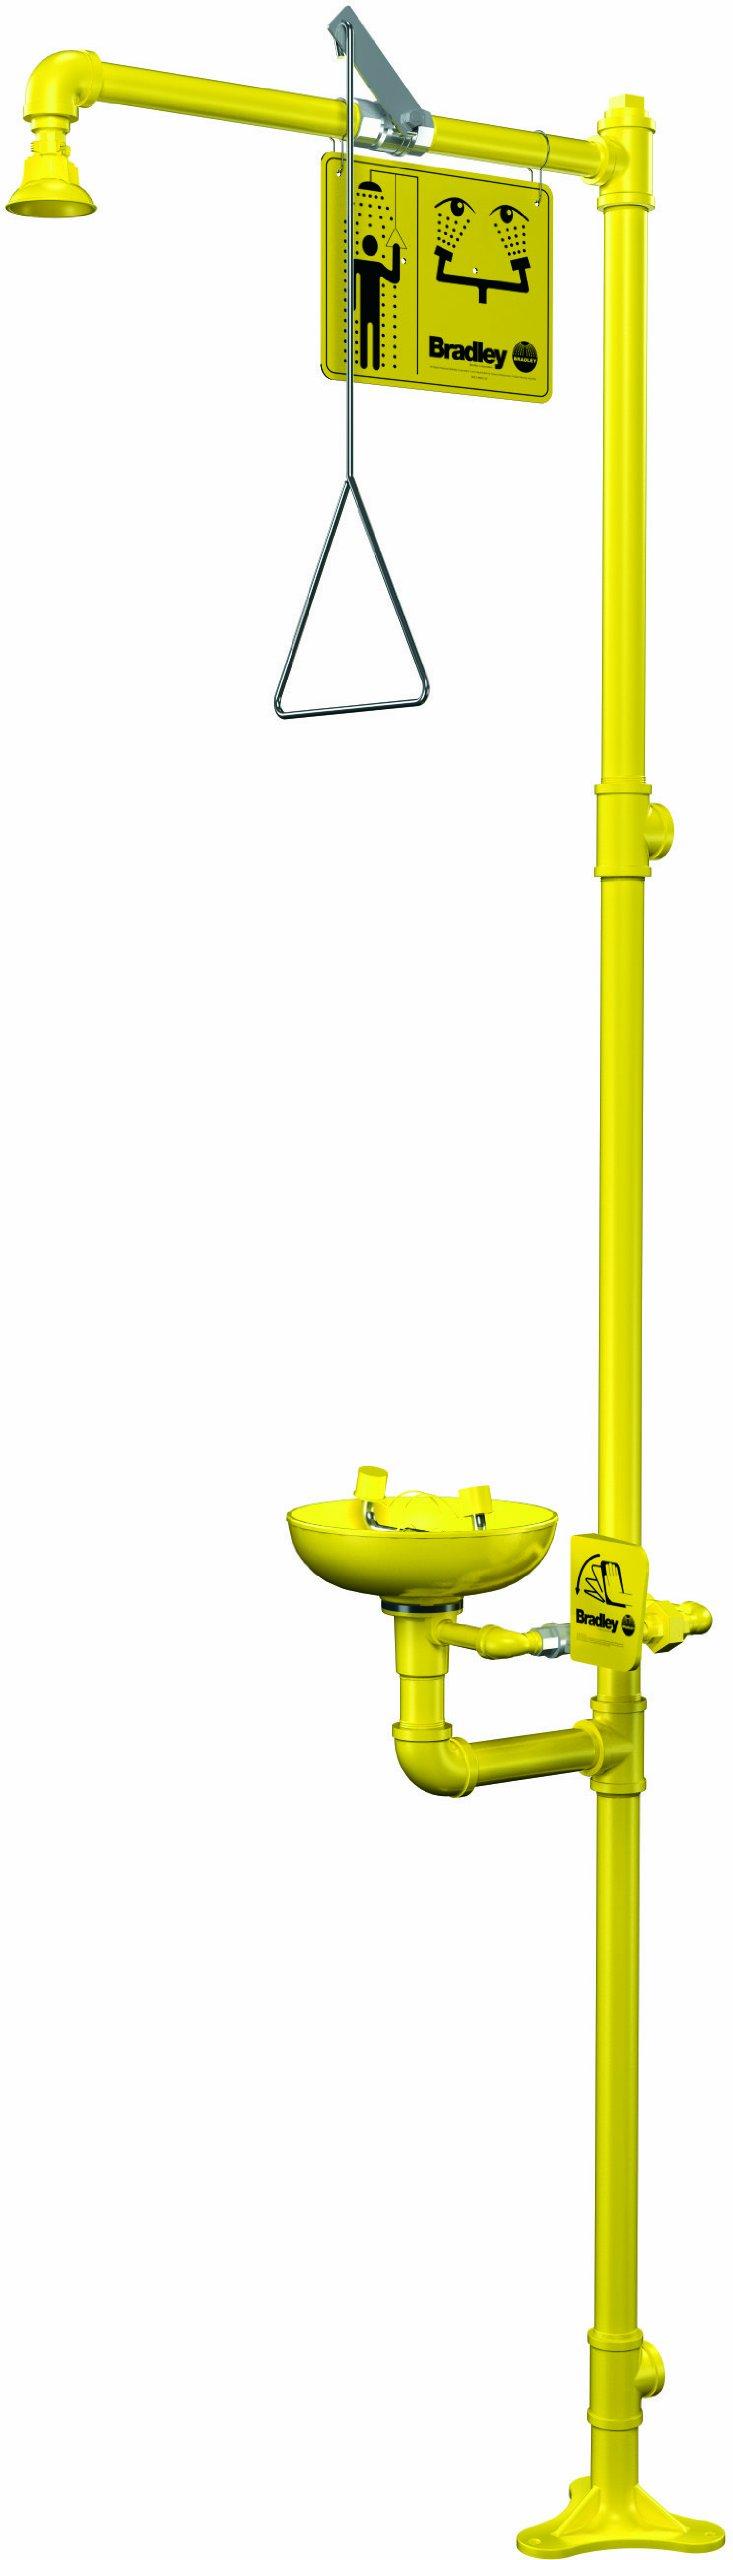 Bradley S19-310 Combination Shower Eyewash Station